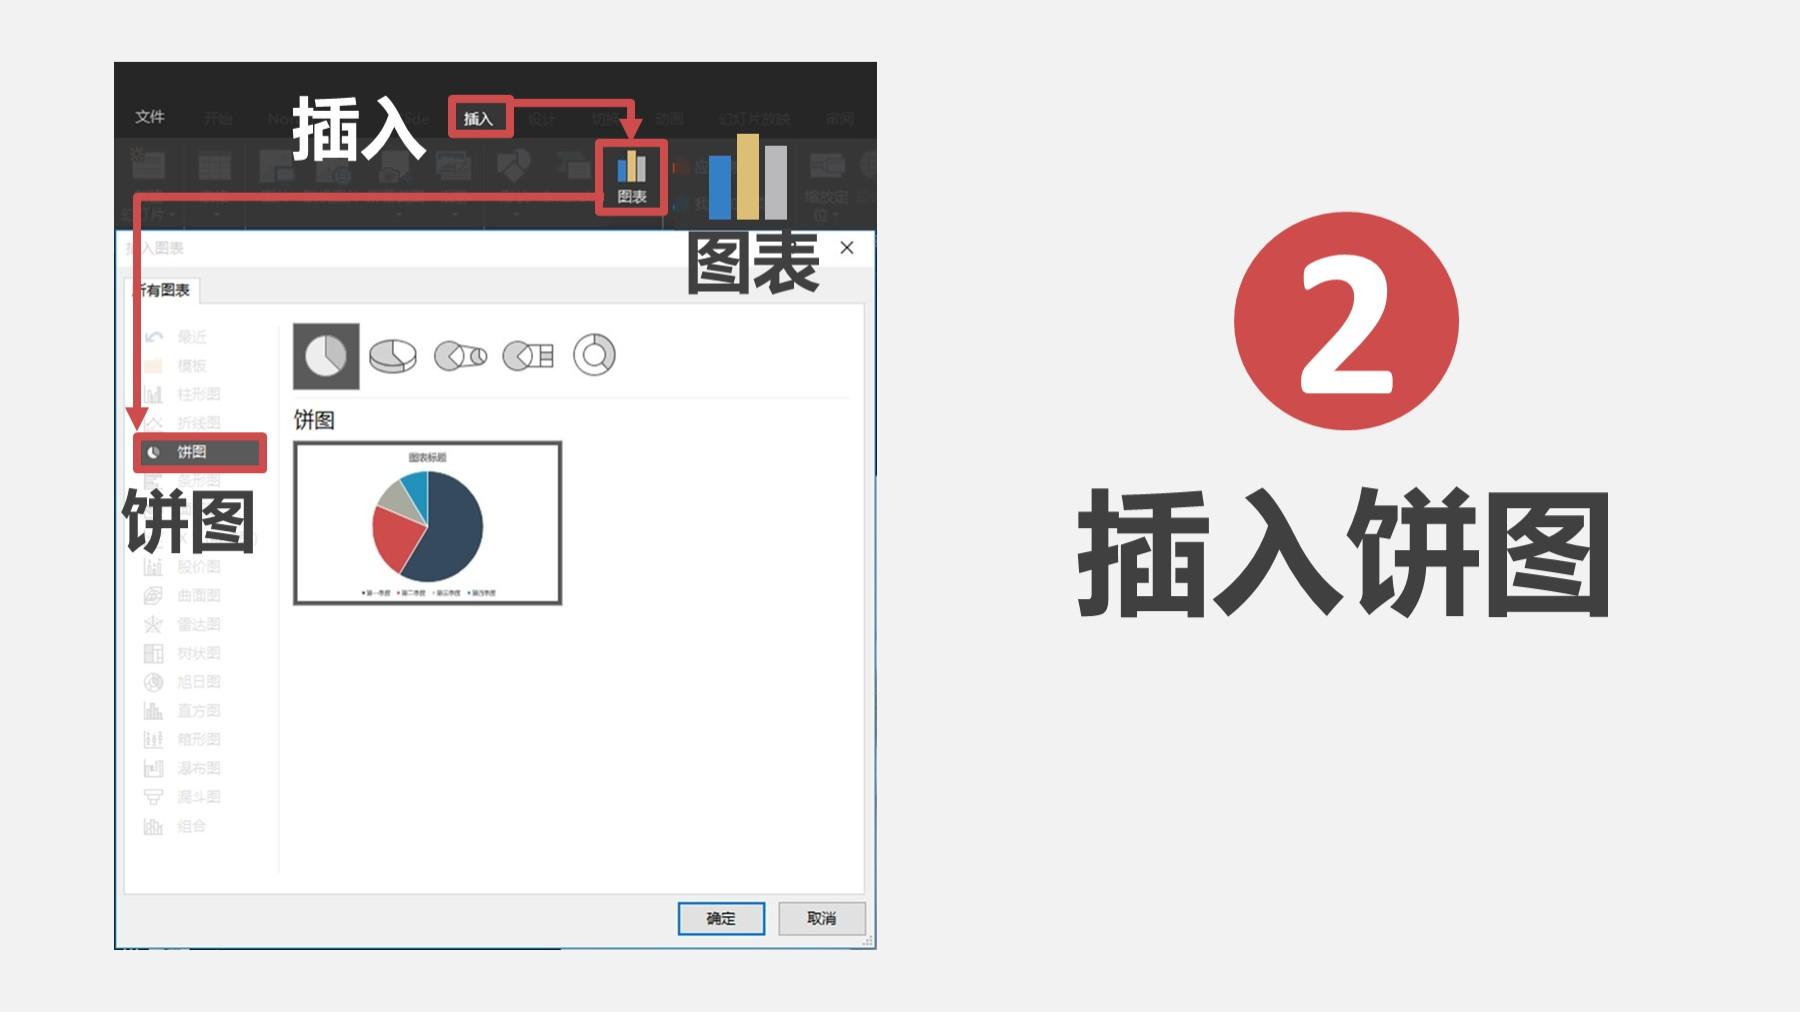 【iSlide】让PPT图表生动起来的方法分享(附源文件下载)